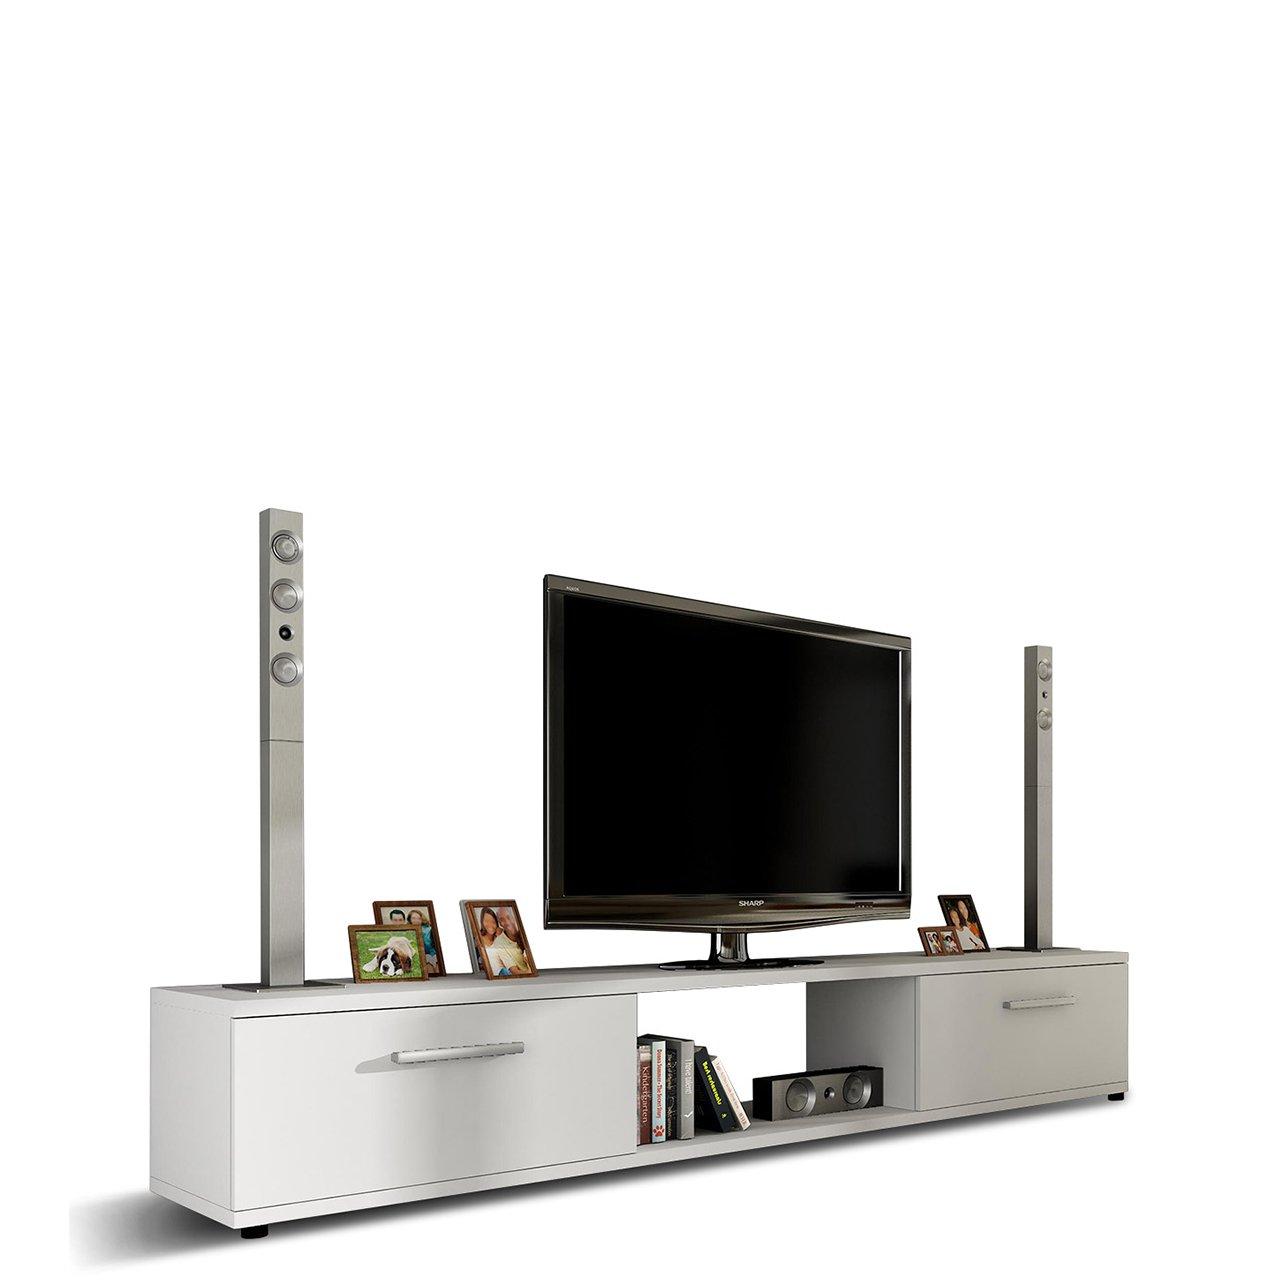 Schön Küche Tv Ideen Montieren Galerie - Küchen Ideen Modern ...